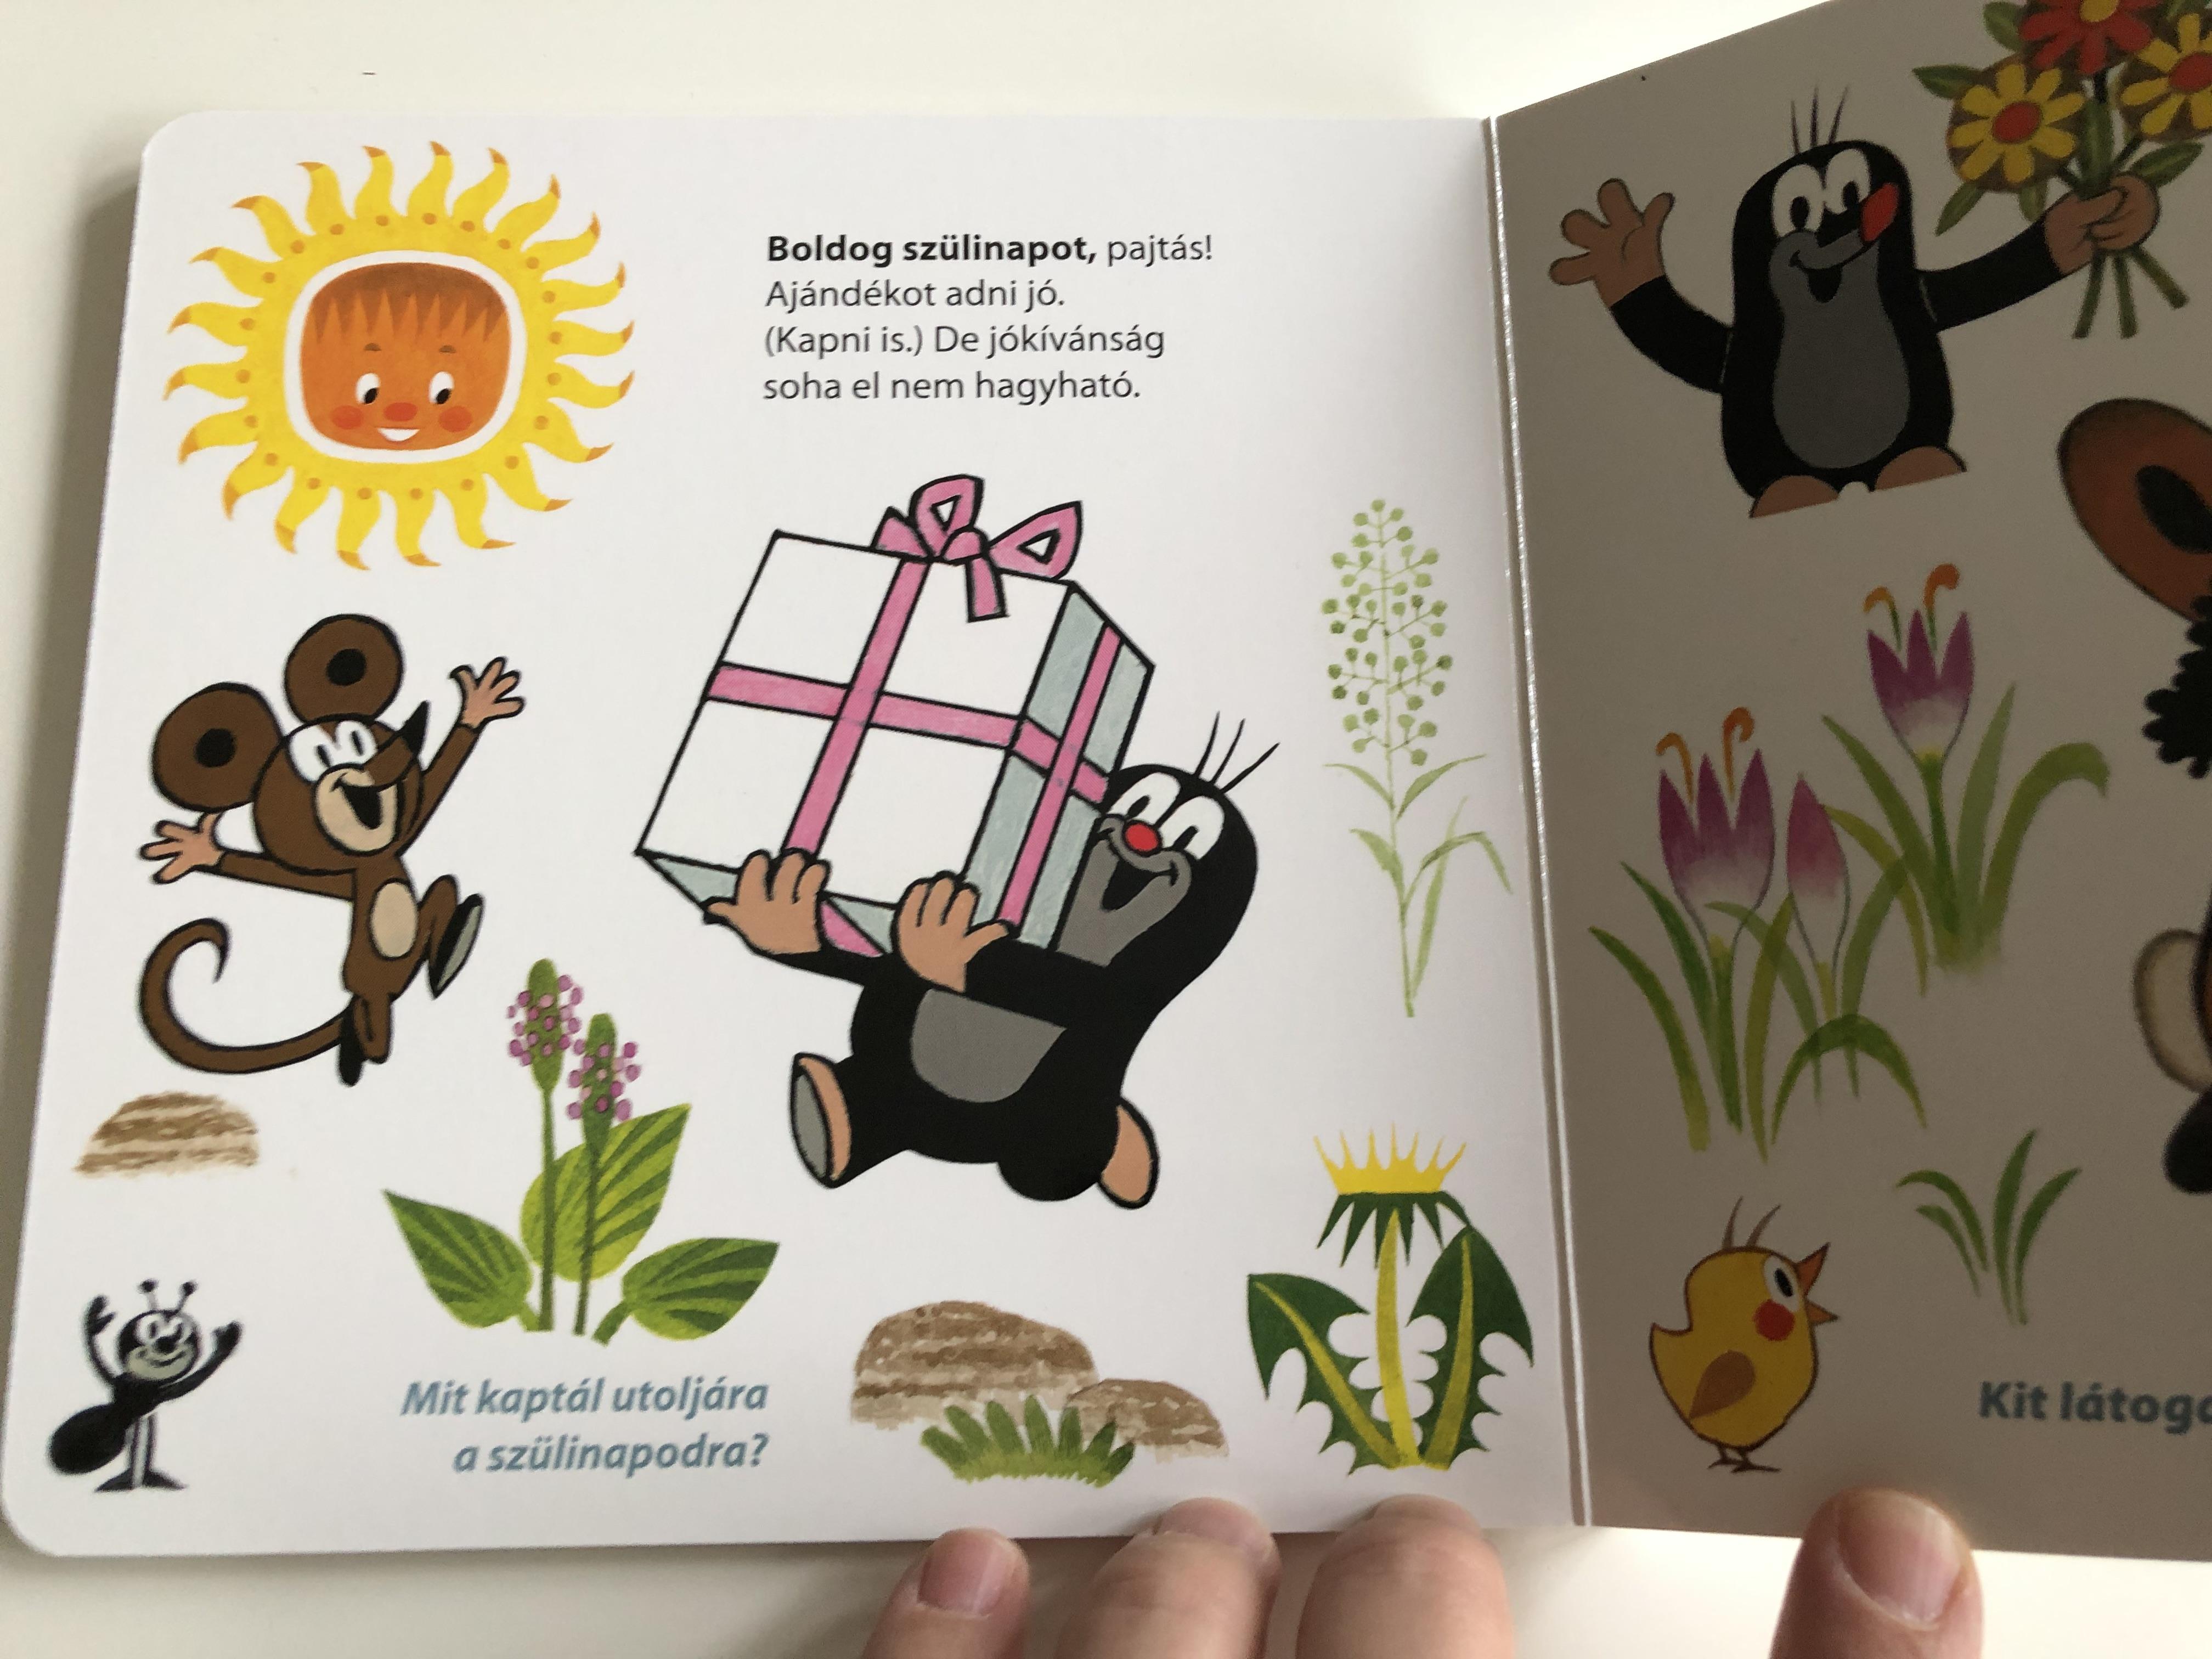 kisvakond-s-az-illem-krtek-and-politeness-author-zden-k-miler-with-the-poems-of-romh-nyi-gnes-hungarian-language-edition-book-for-children-5-.jpg